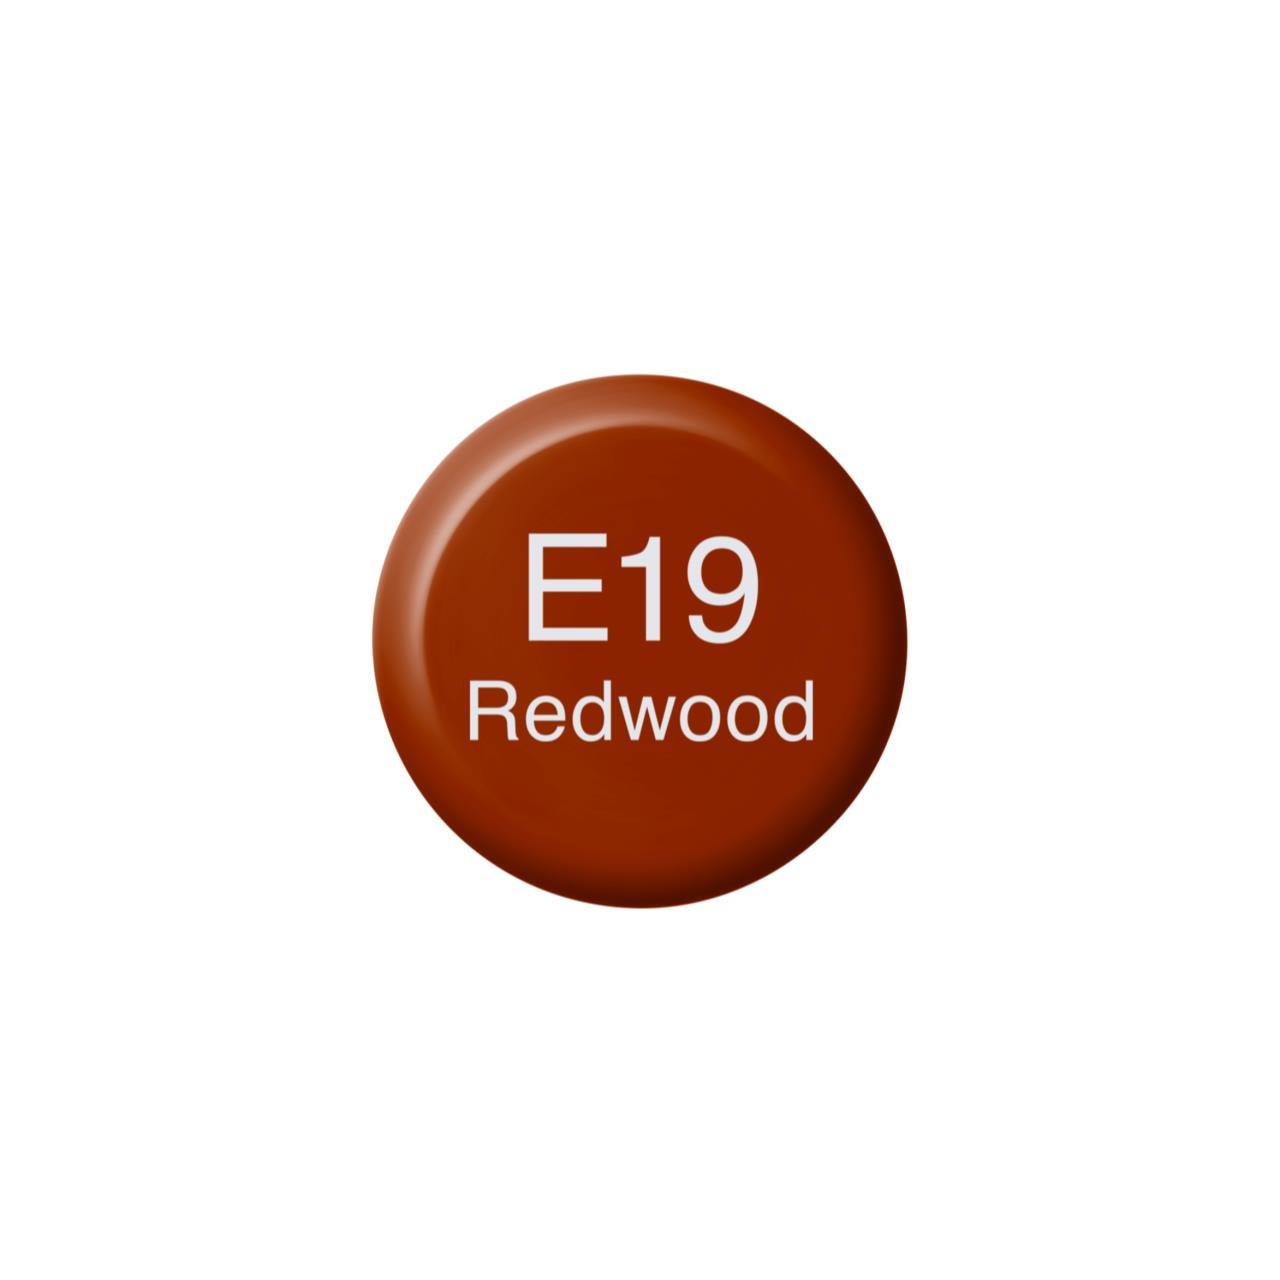 E19 Redwood, Copic Ink - 4511338056721